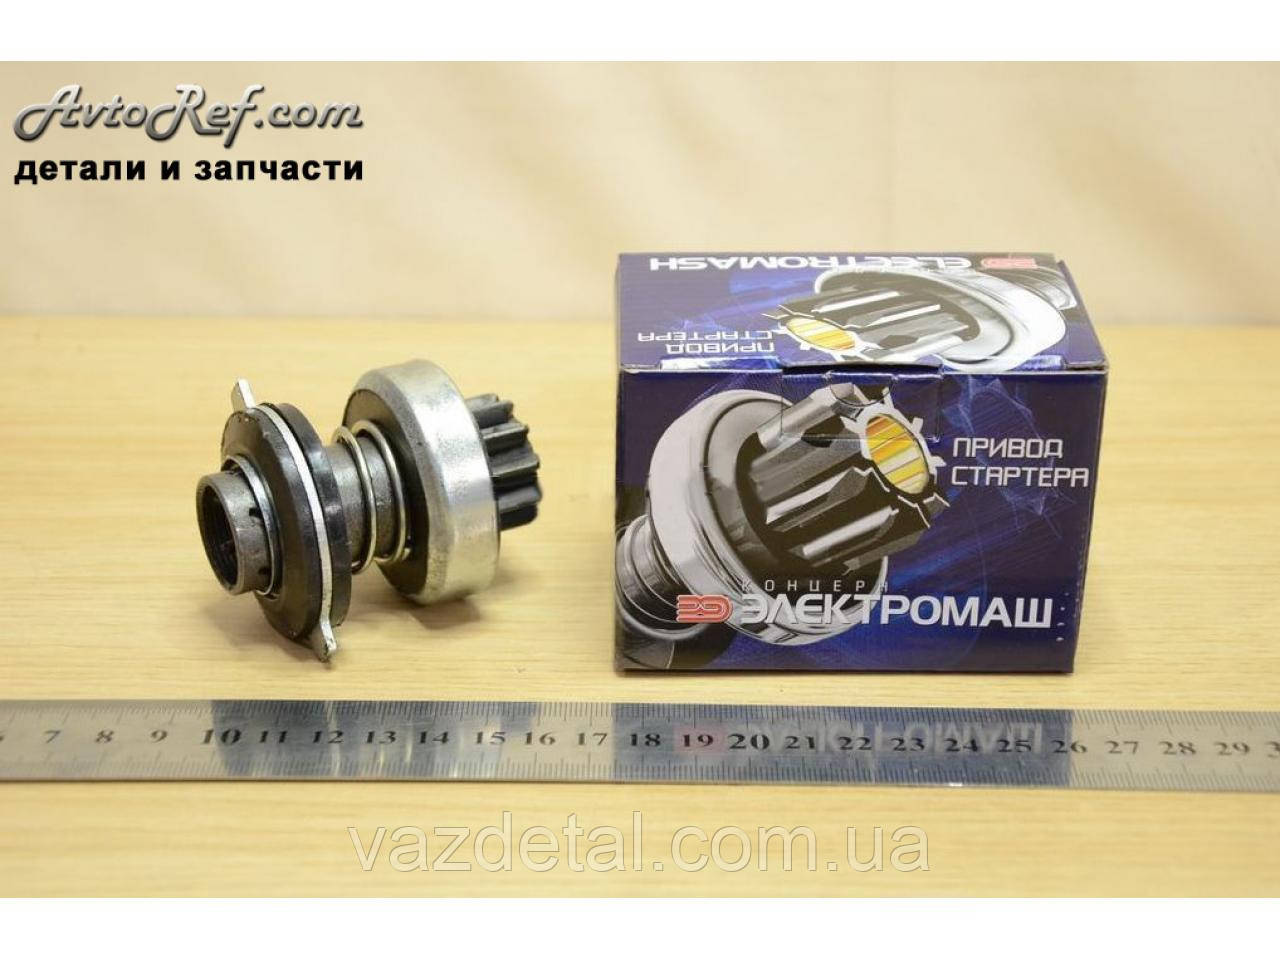 Бендекс ваз 2101 2102 2103 2104 2105 2106 2107 2121 21213 нива тайга руский стартер (Электромаш) 50.600  копия